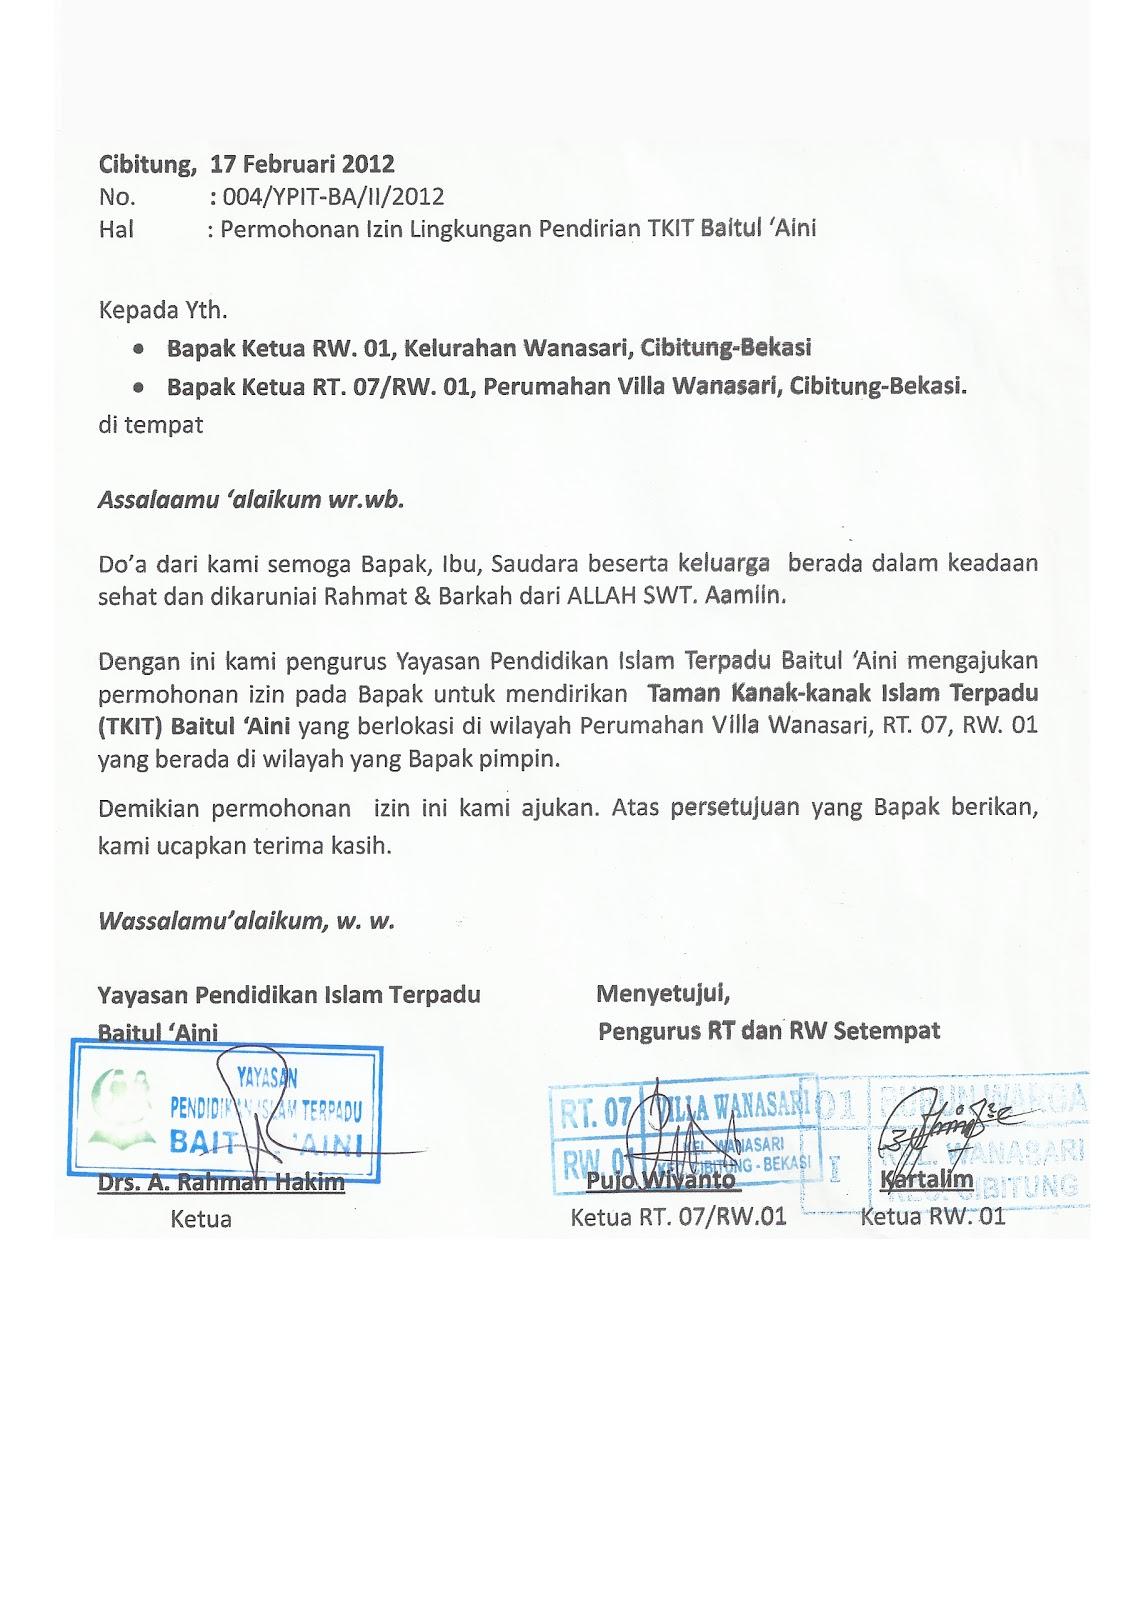 Contoh Surat Permohonan Izin Kegiatan Contoh Surat